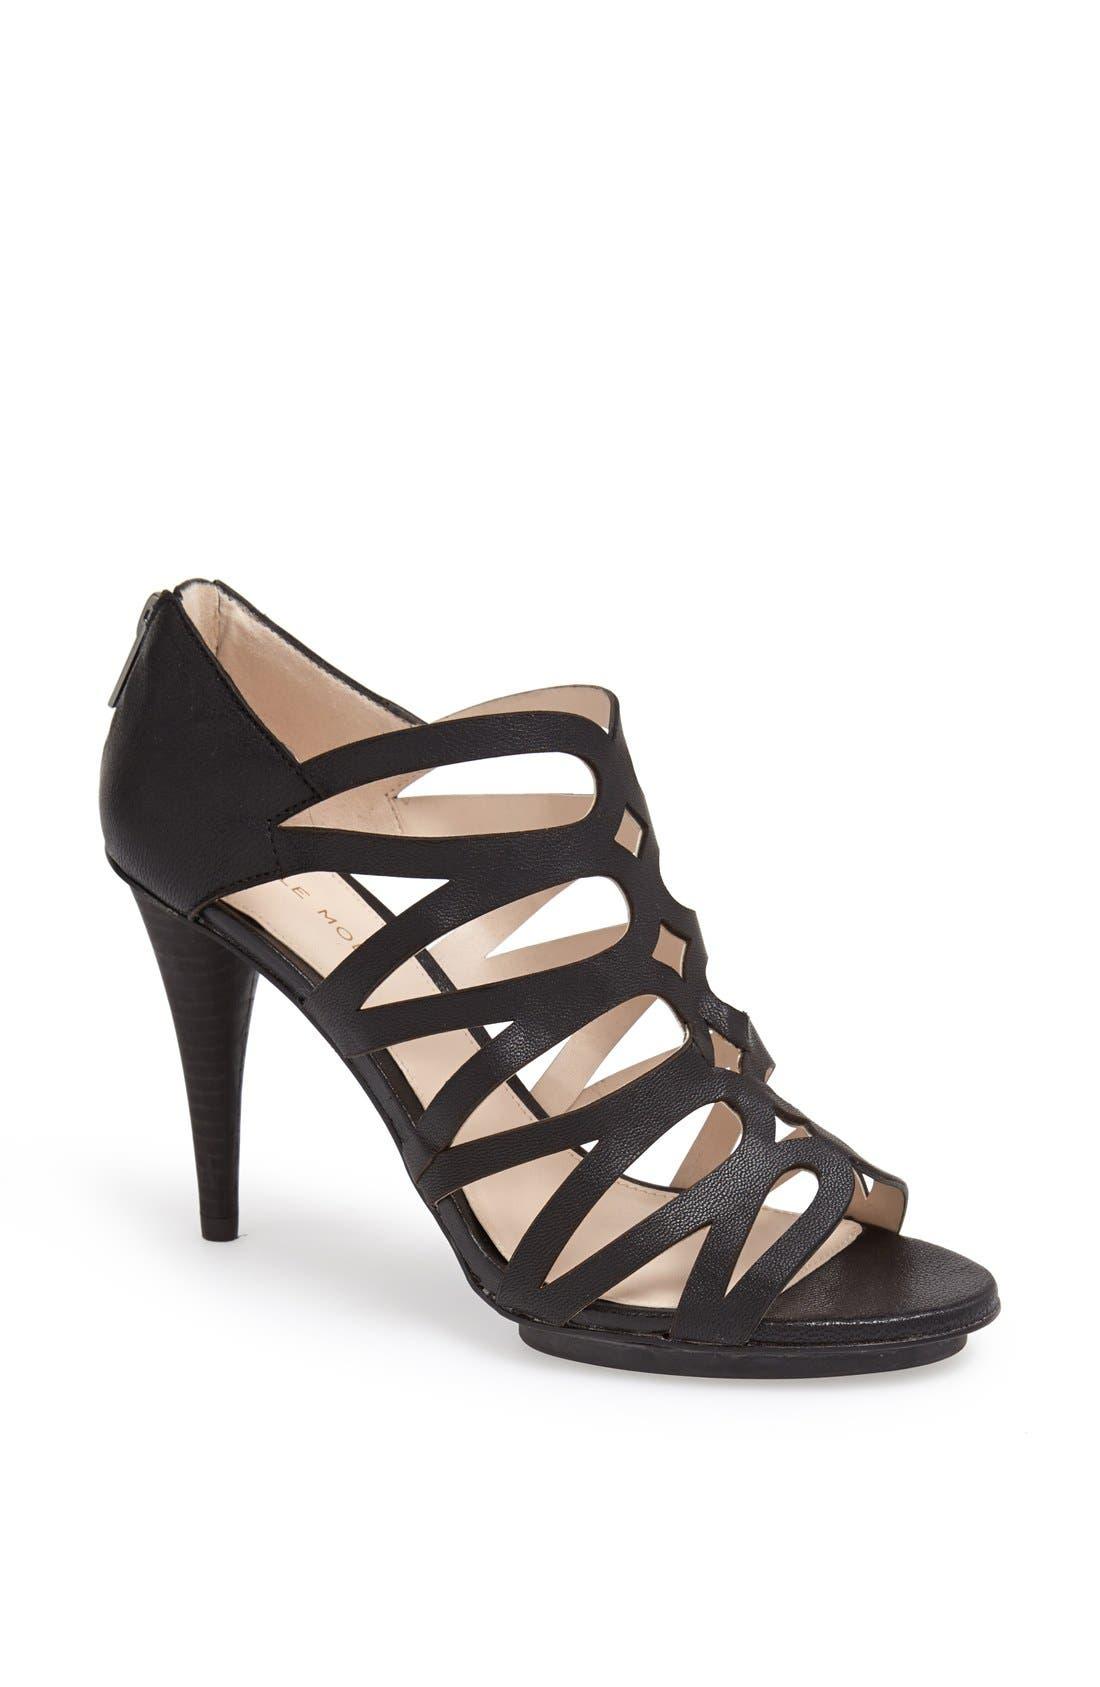 Main Image - Pelle Moda 'Robyn' Leather Sandal